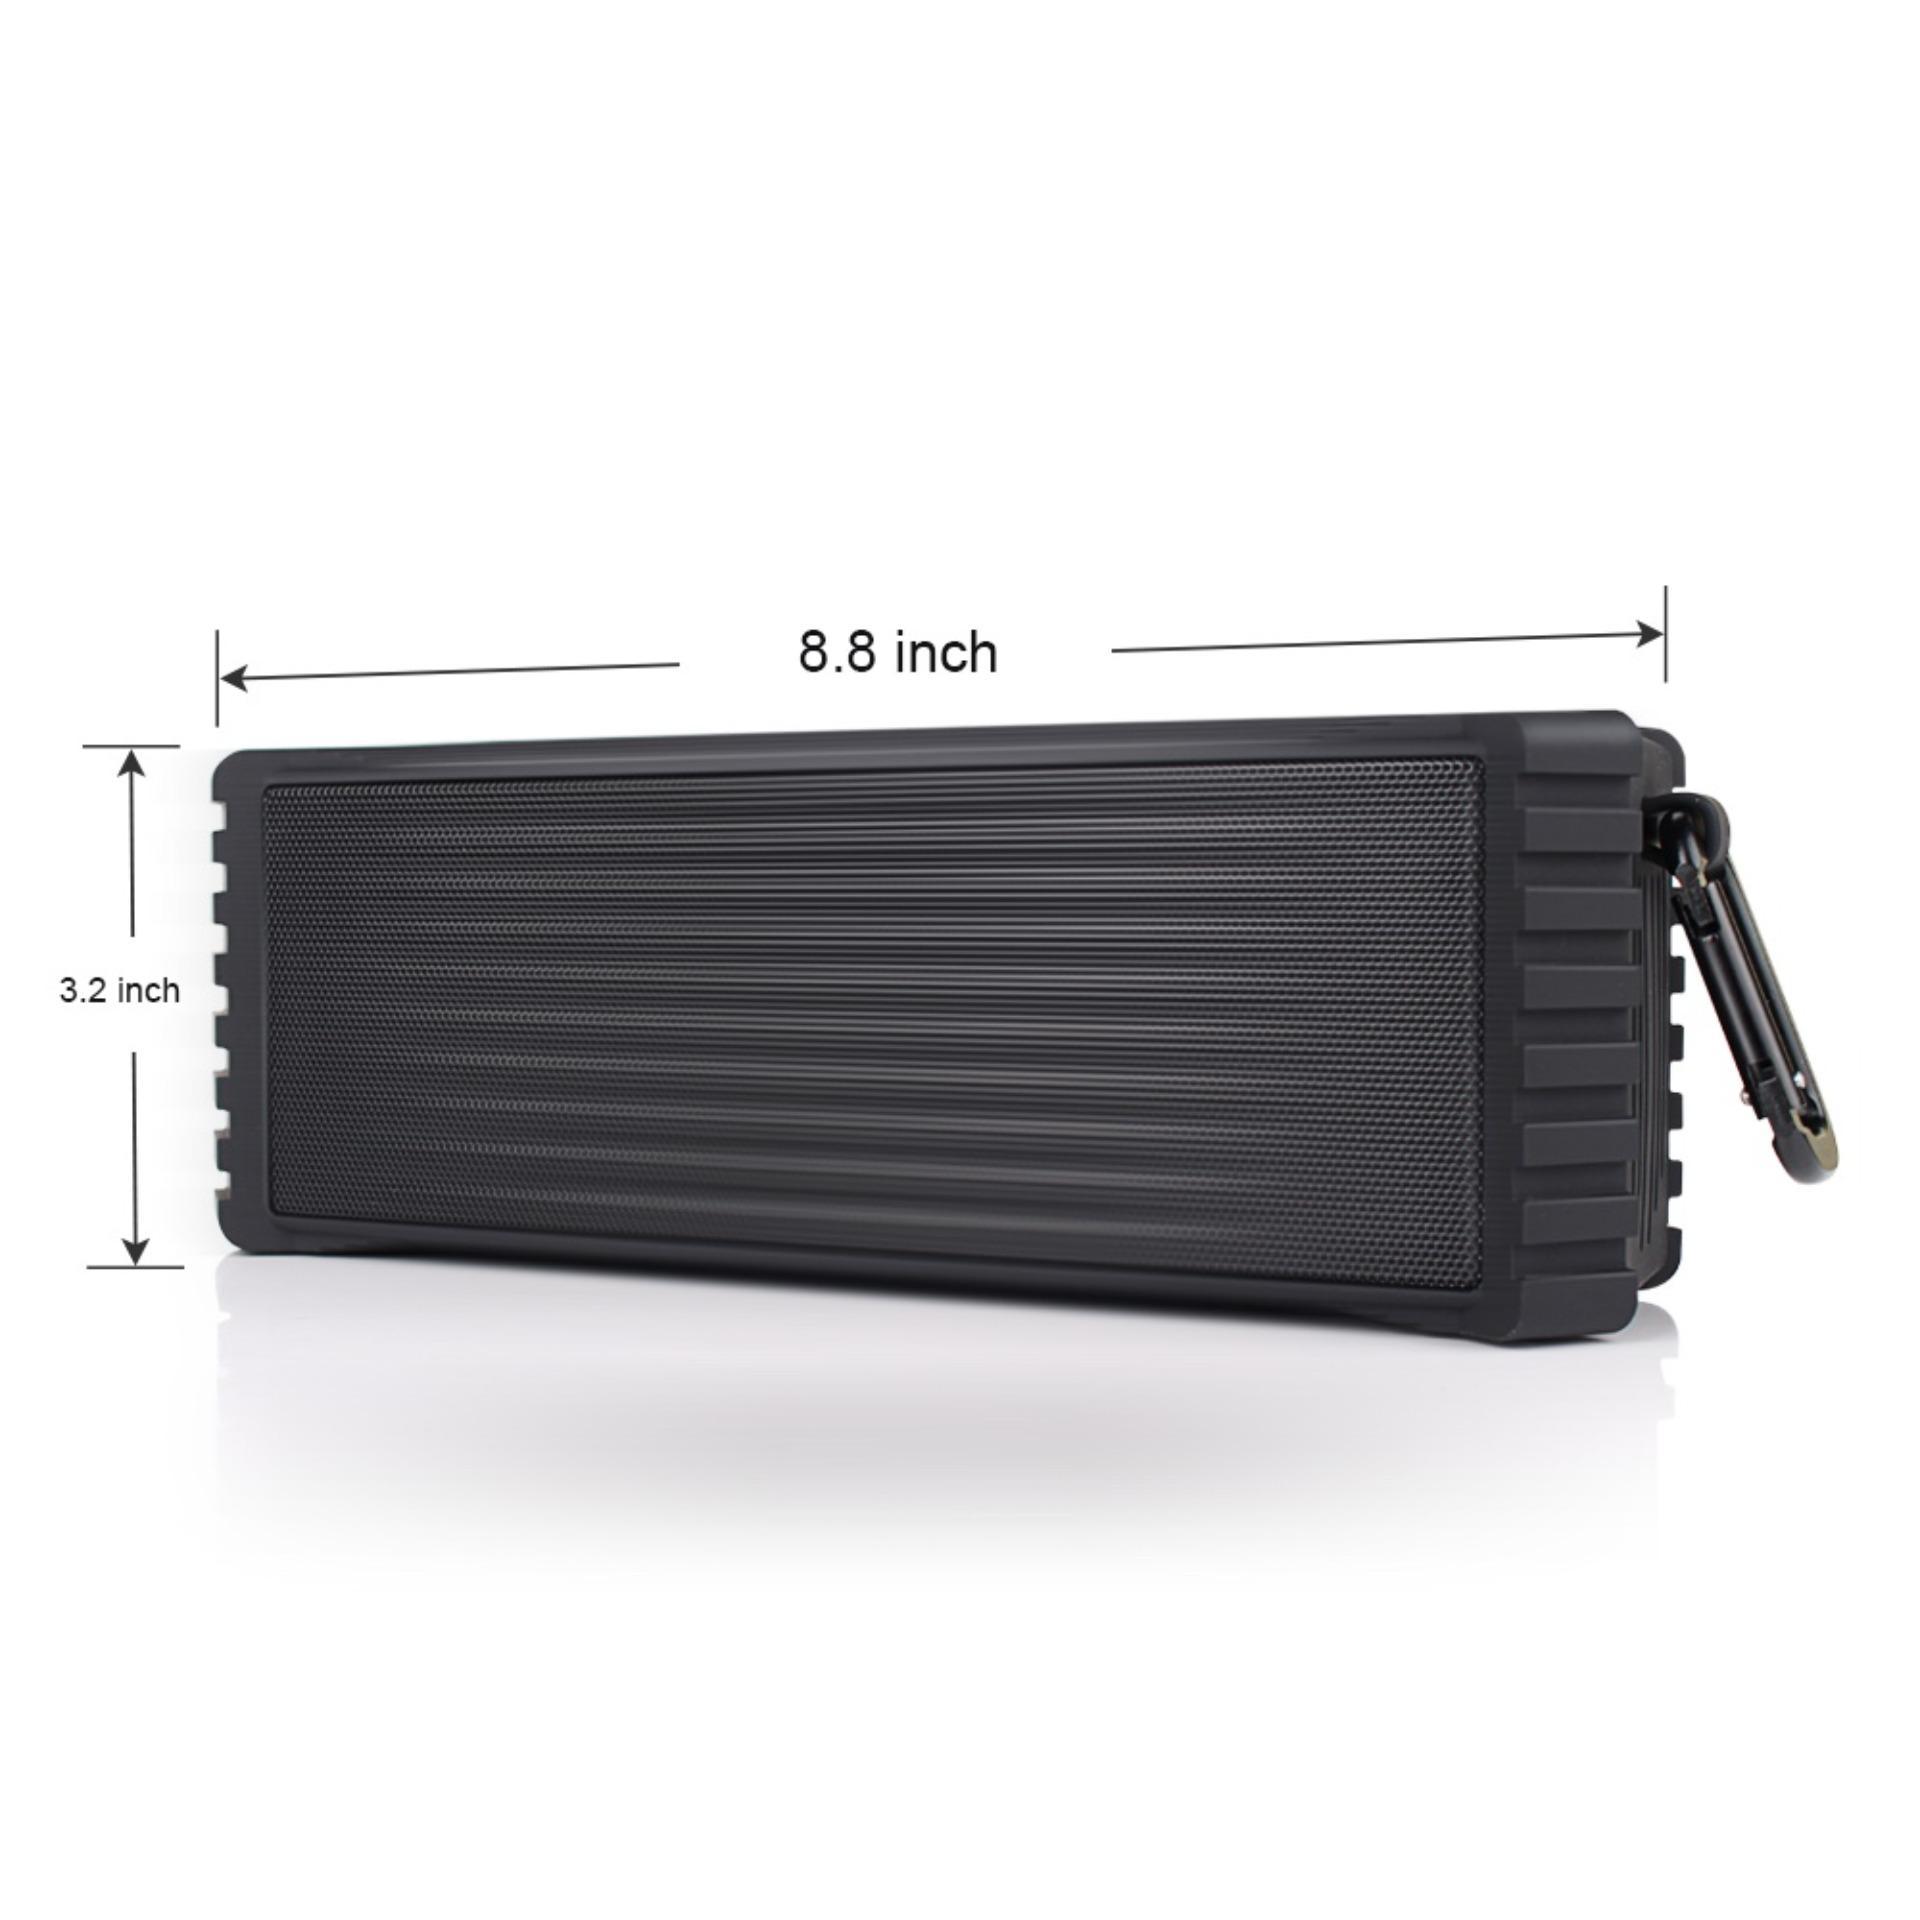 ... JUSHENG ELlight 20W Waterproof Outdoor Speaker,Wireless Bluetooth4.2 Speaker with Passive Radiator, ...